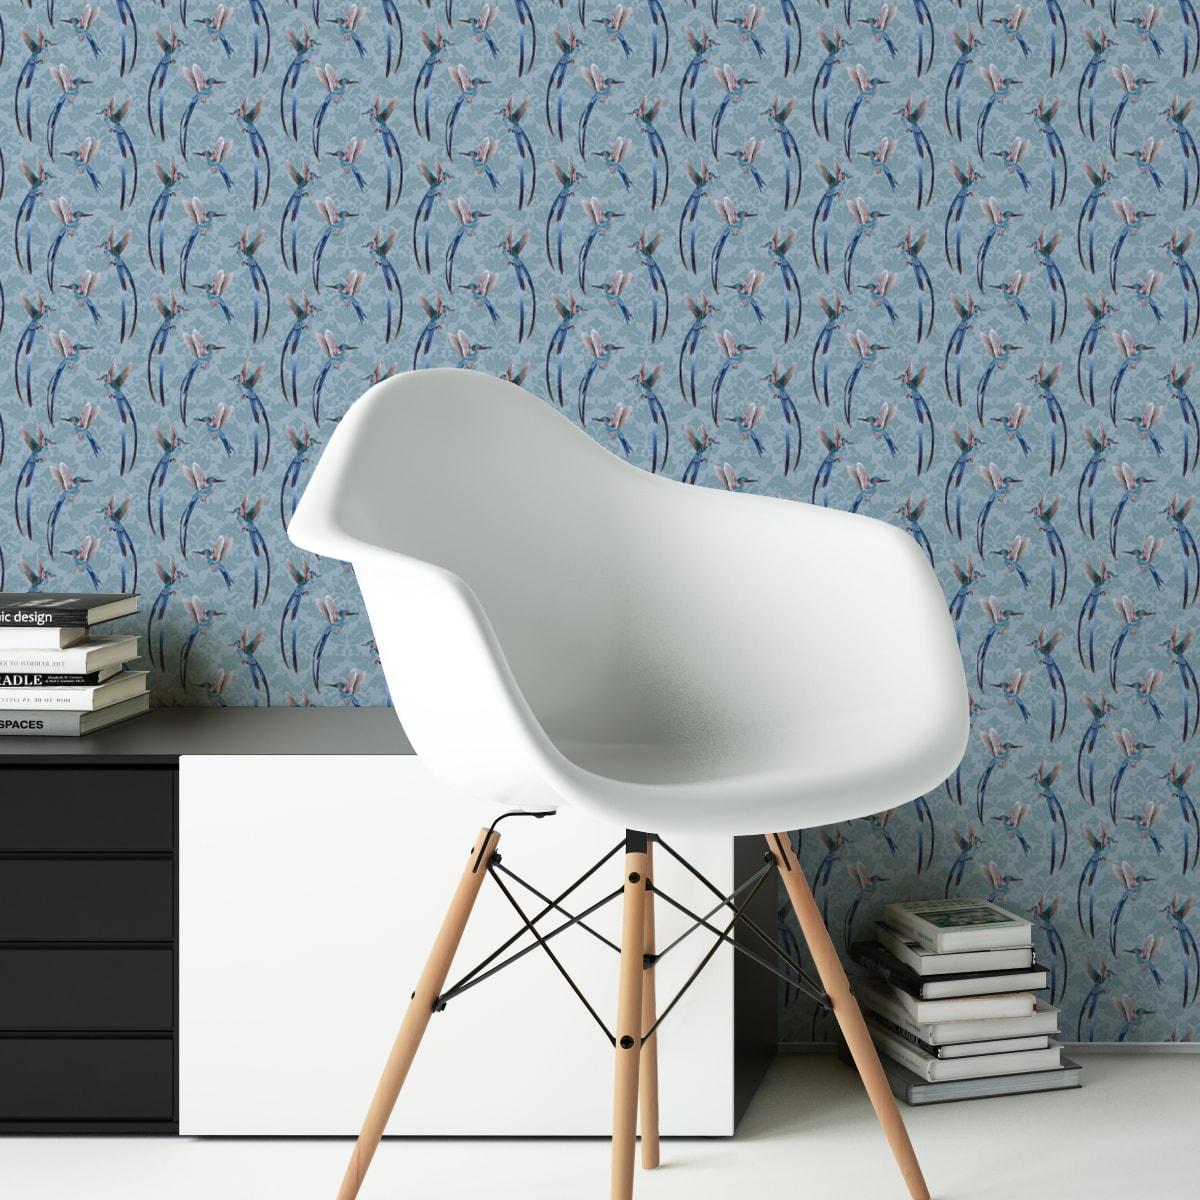 "Wandtapete hellblau: Kolobri Design Tapete ""Damast-Elfen"" auf Damast Muster in blau"